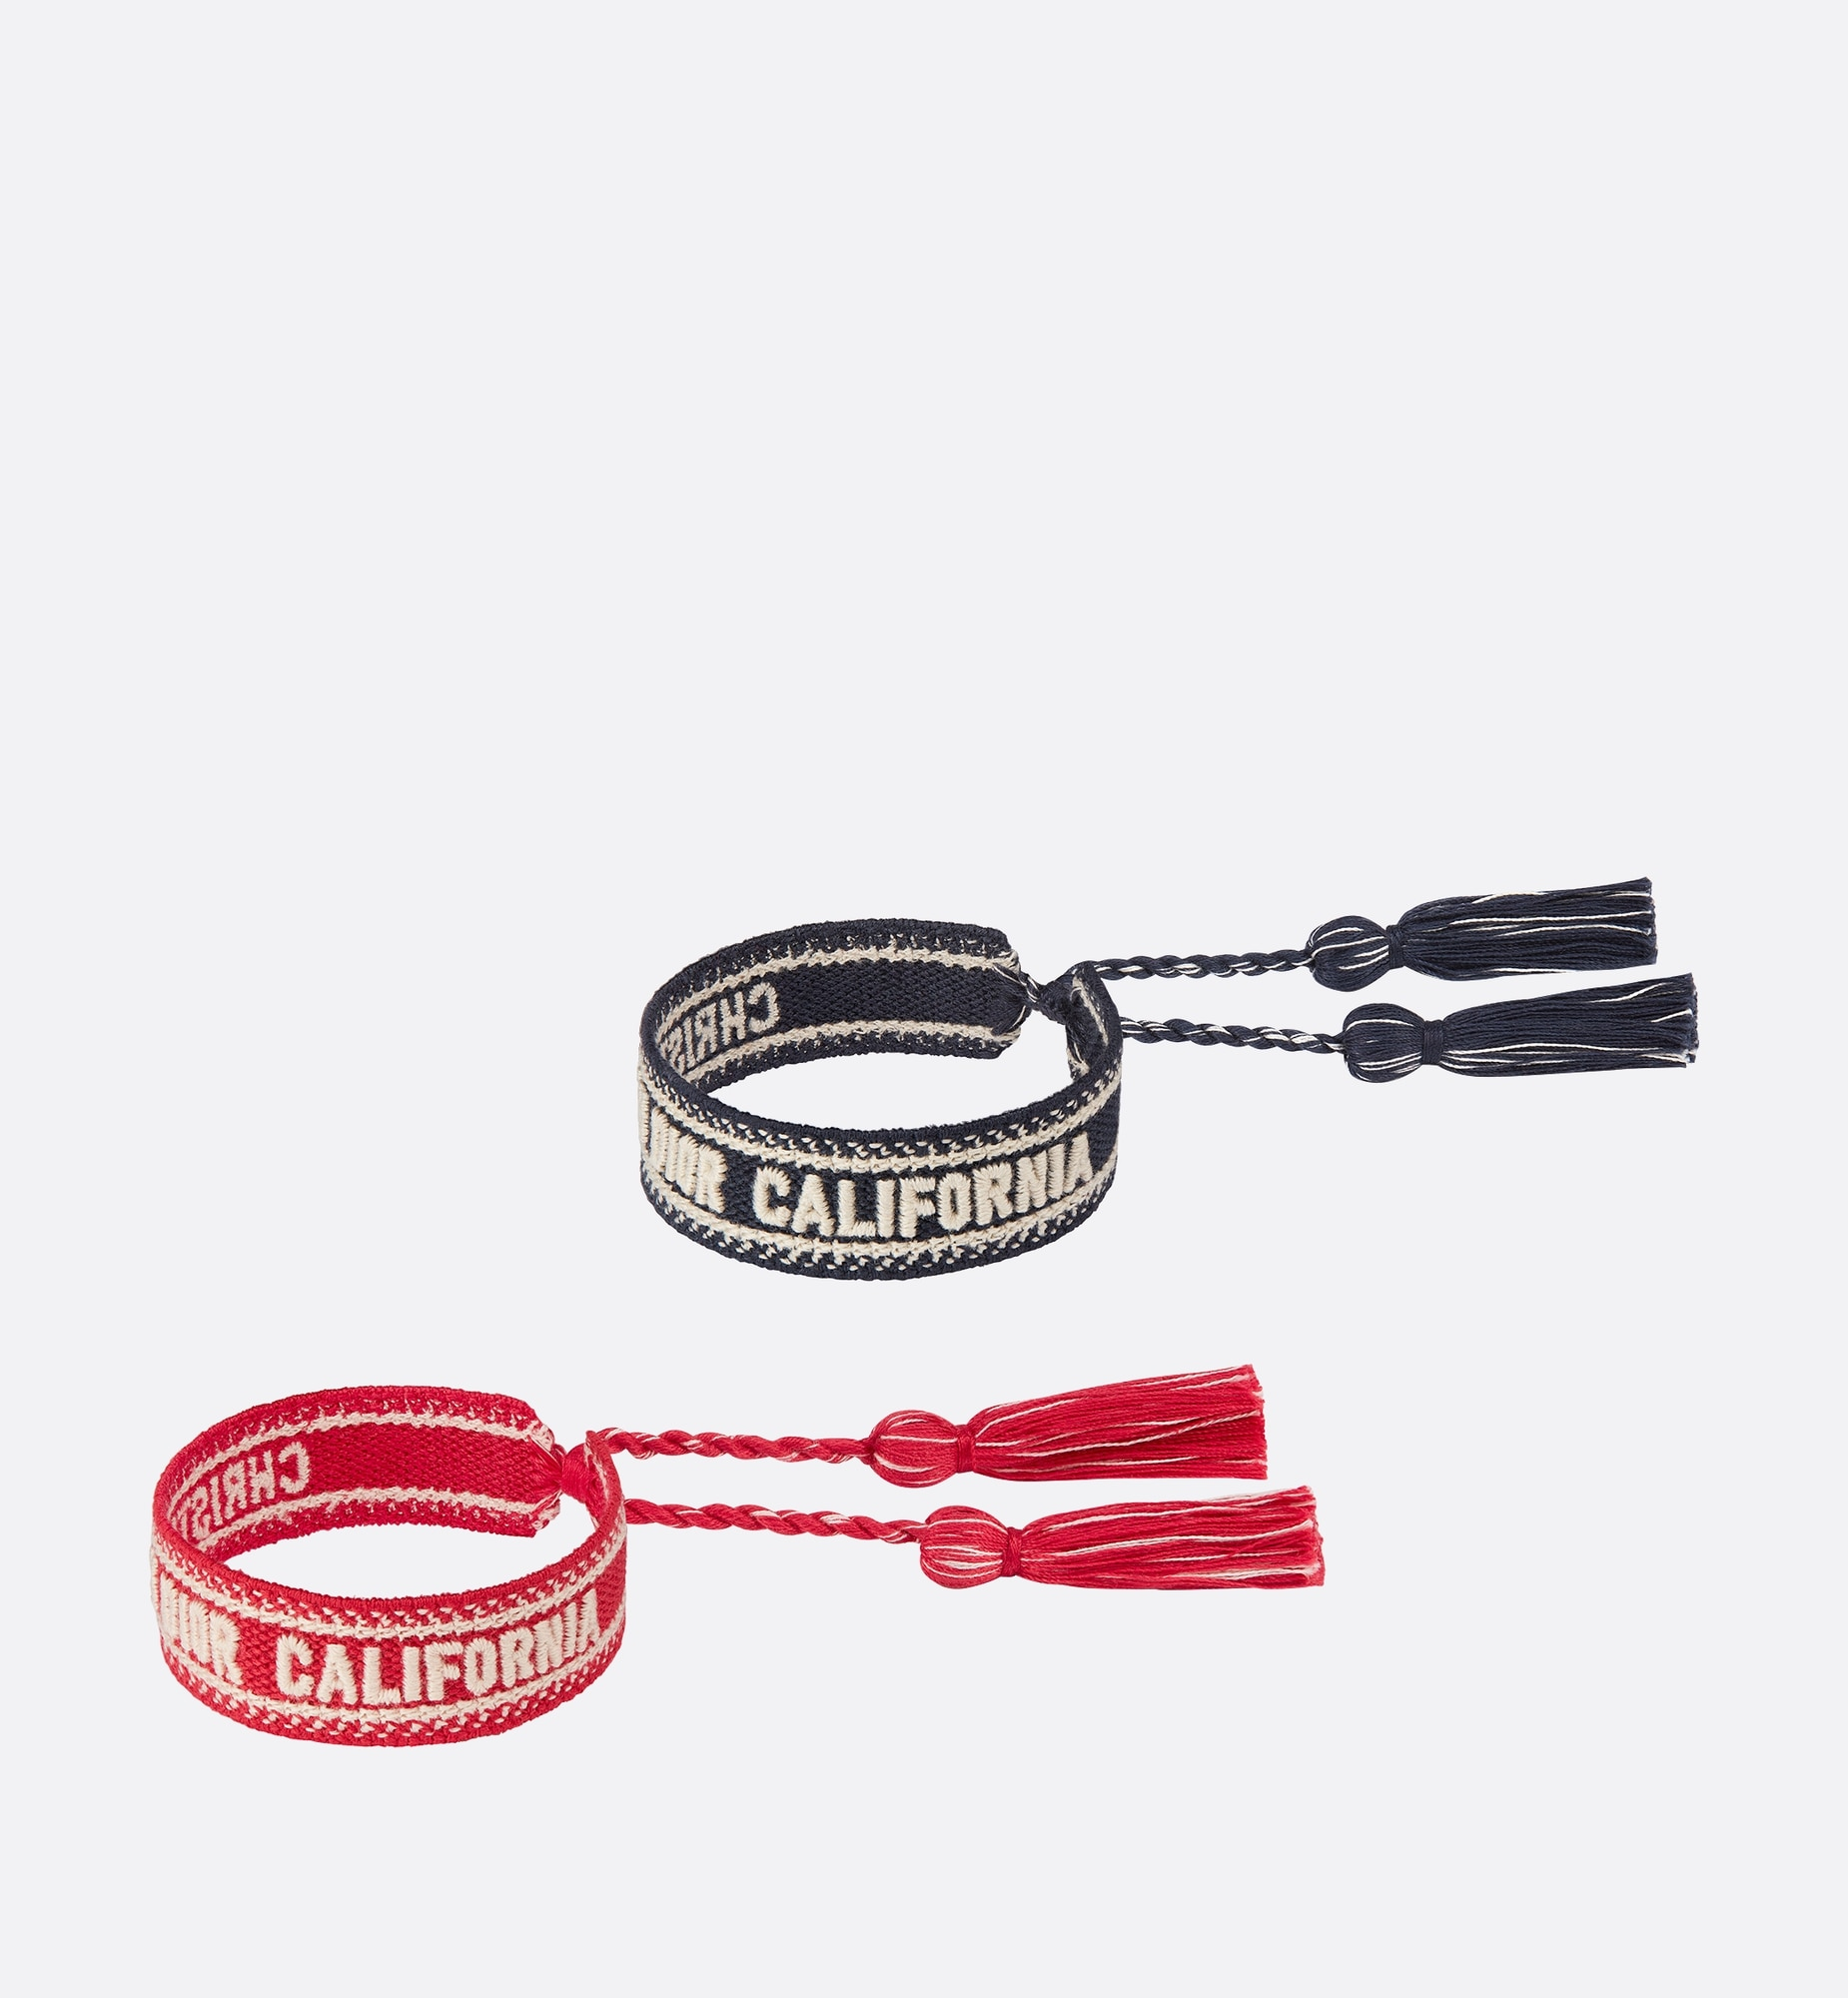 J'Adior 'CALIFORNIA' Bracelet Set Profile view